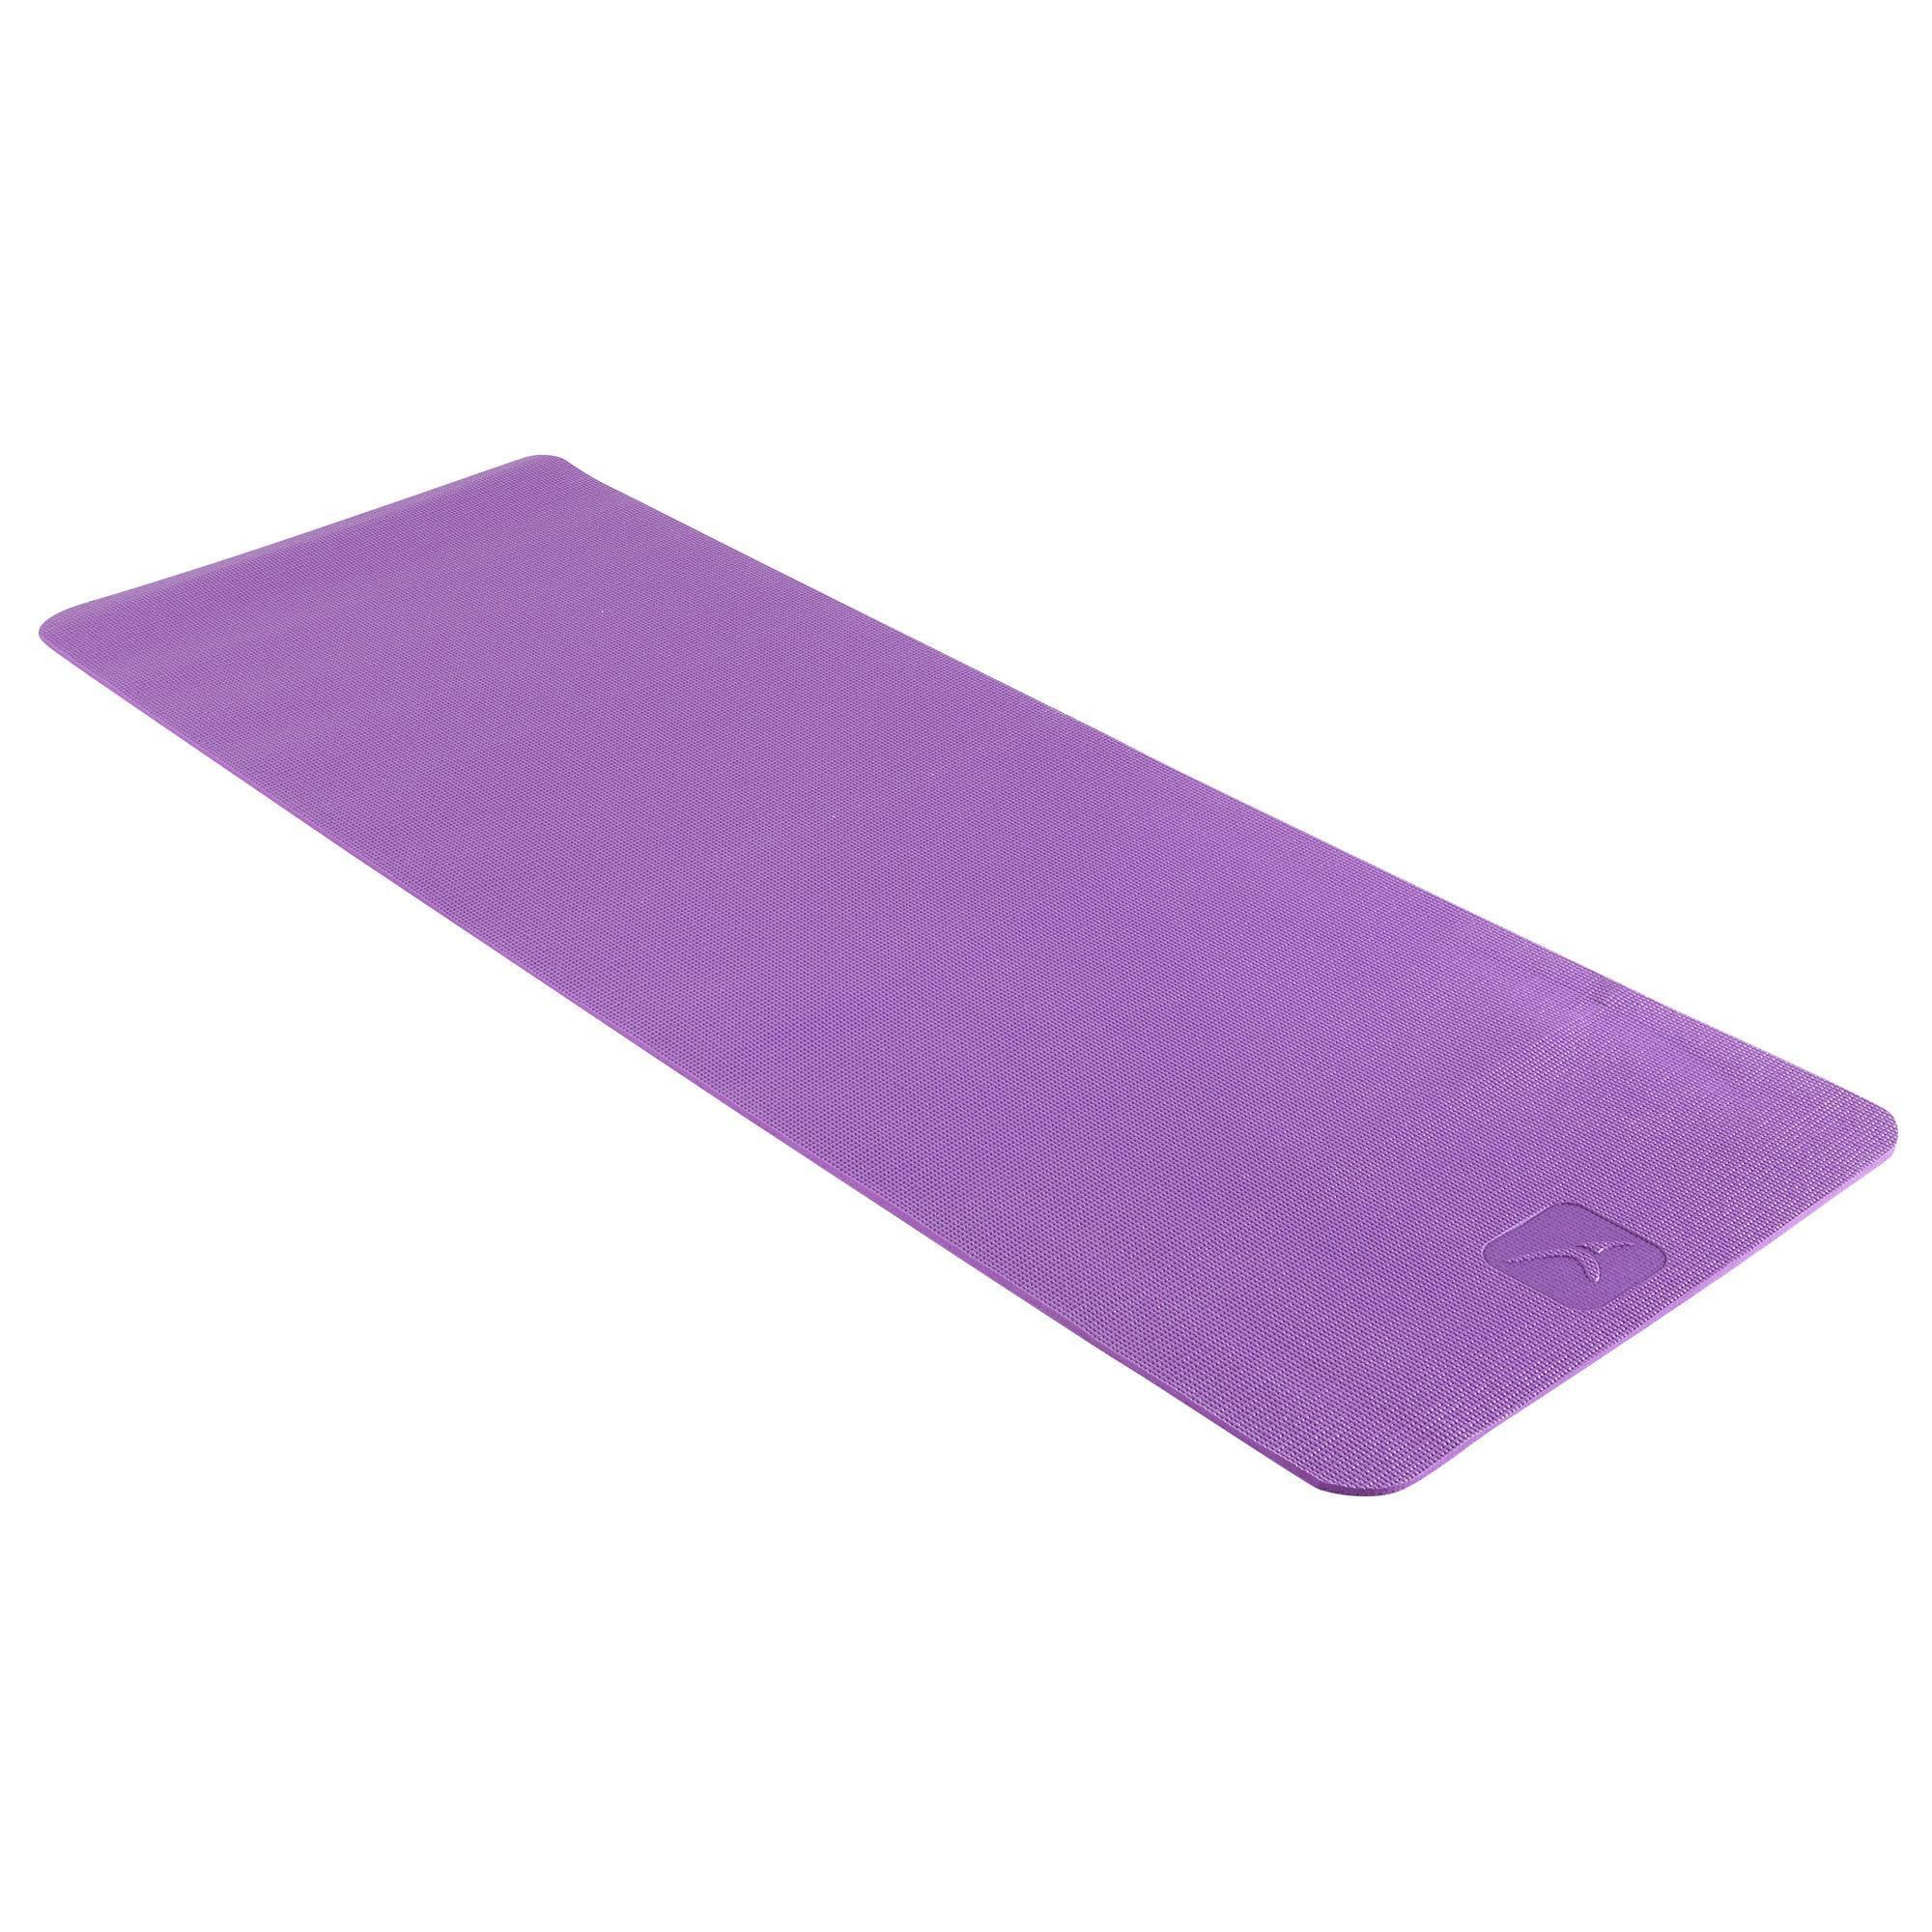 care recovery comfort 8 mm yoga mat domyos decathlon